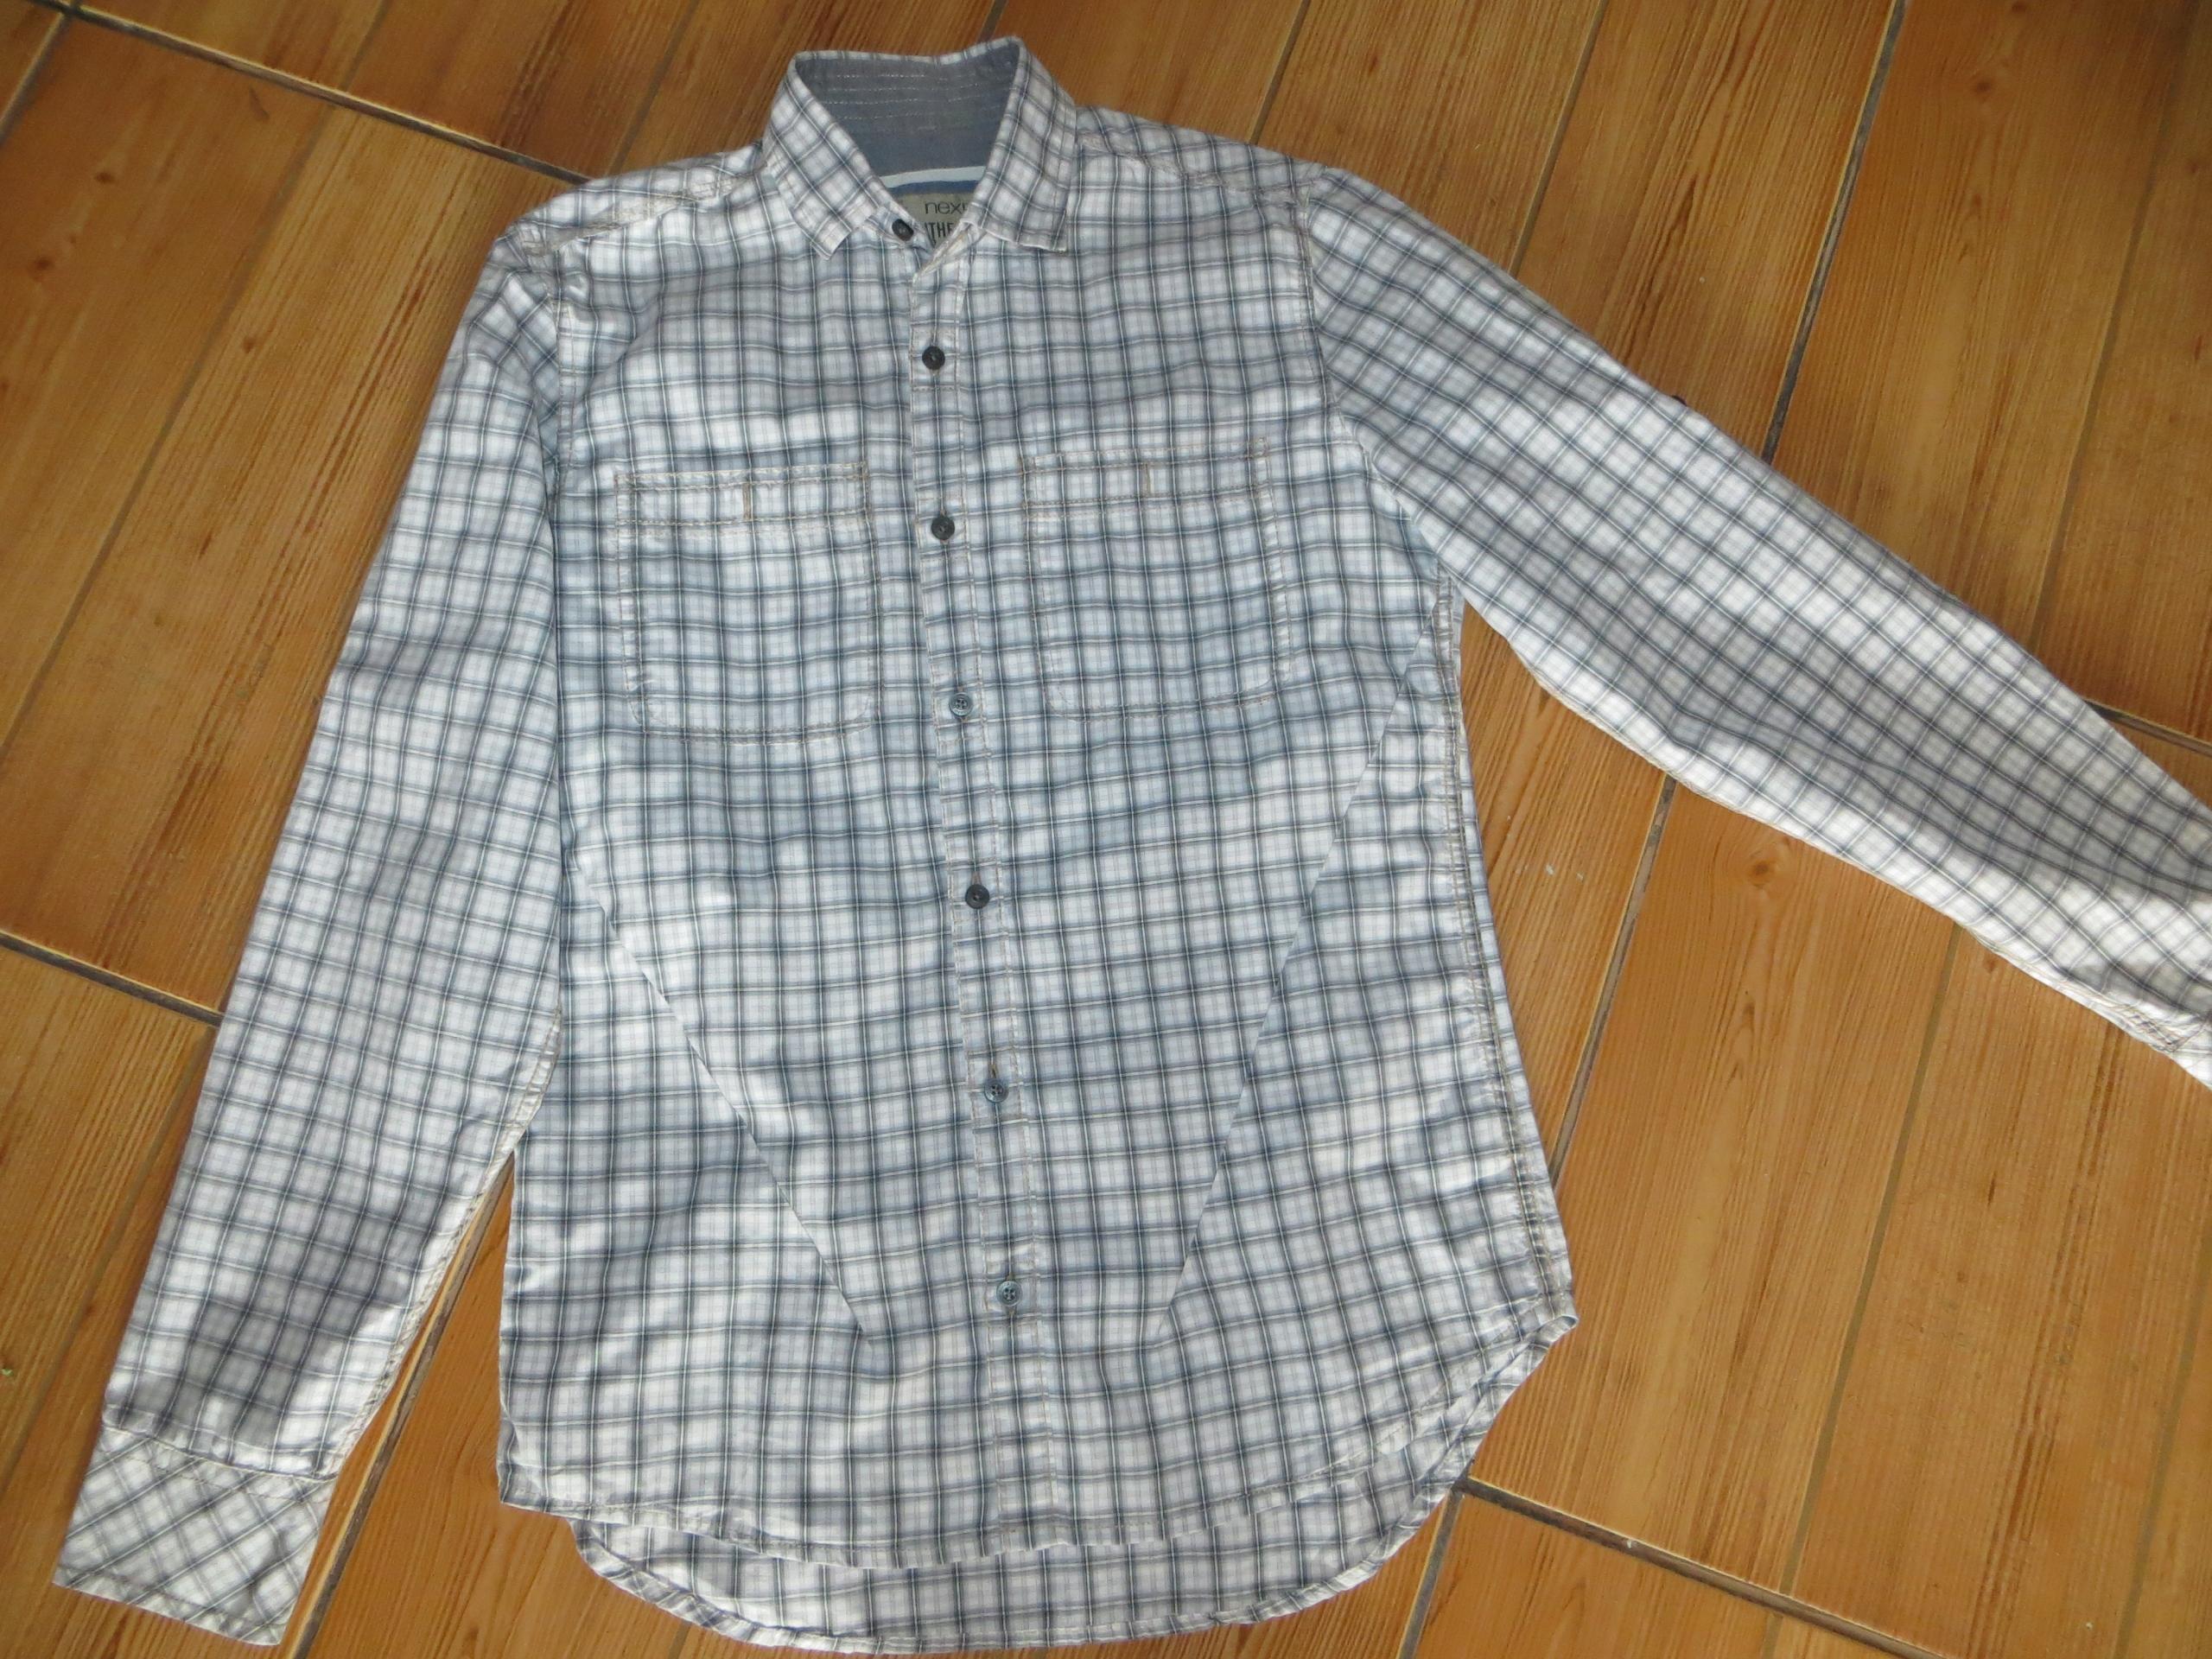 Koszula męska NEXT rozmiar S